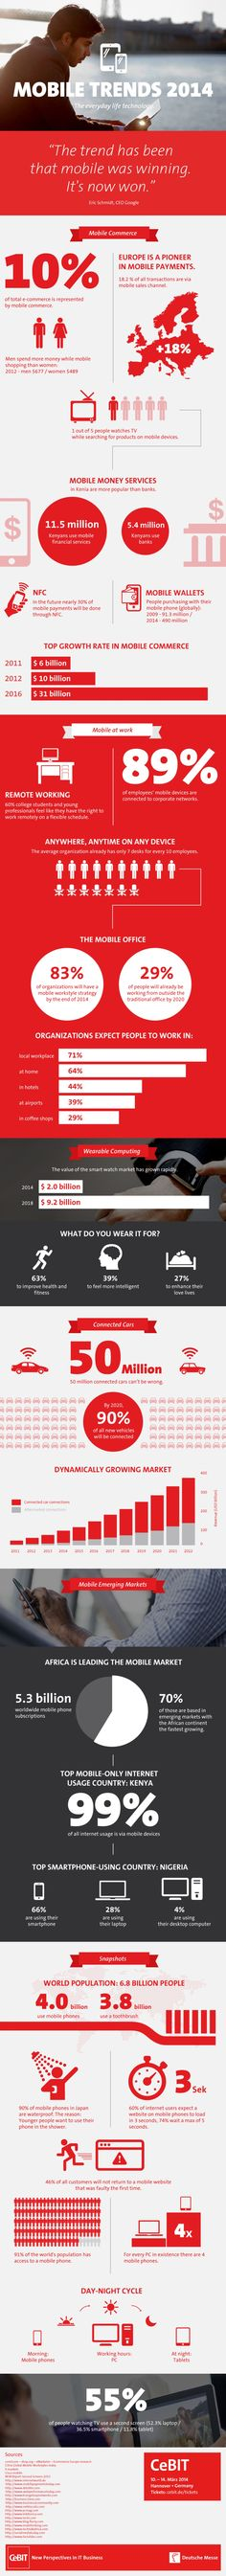 Infografik Mobile - CeBIT 2014 Mobile Trends 2014 The everyday Life Technology